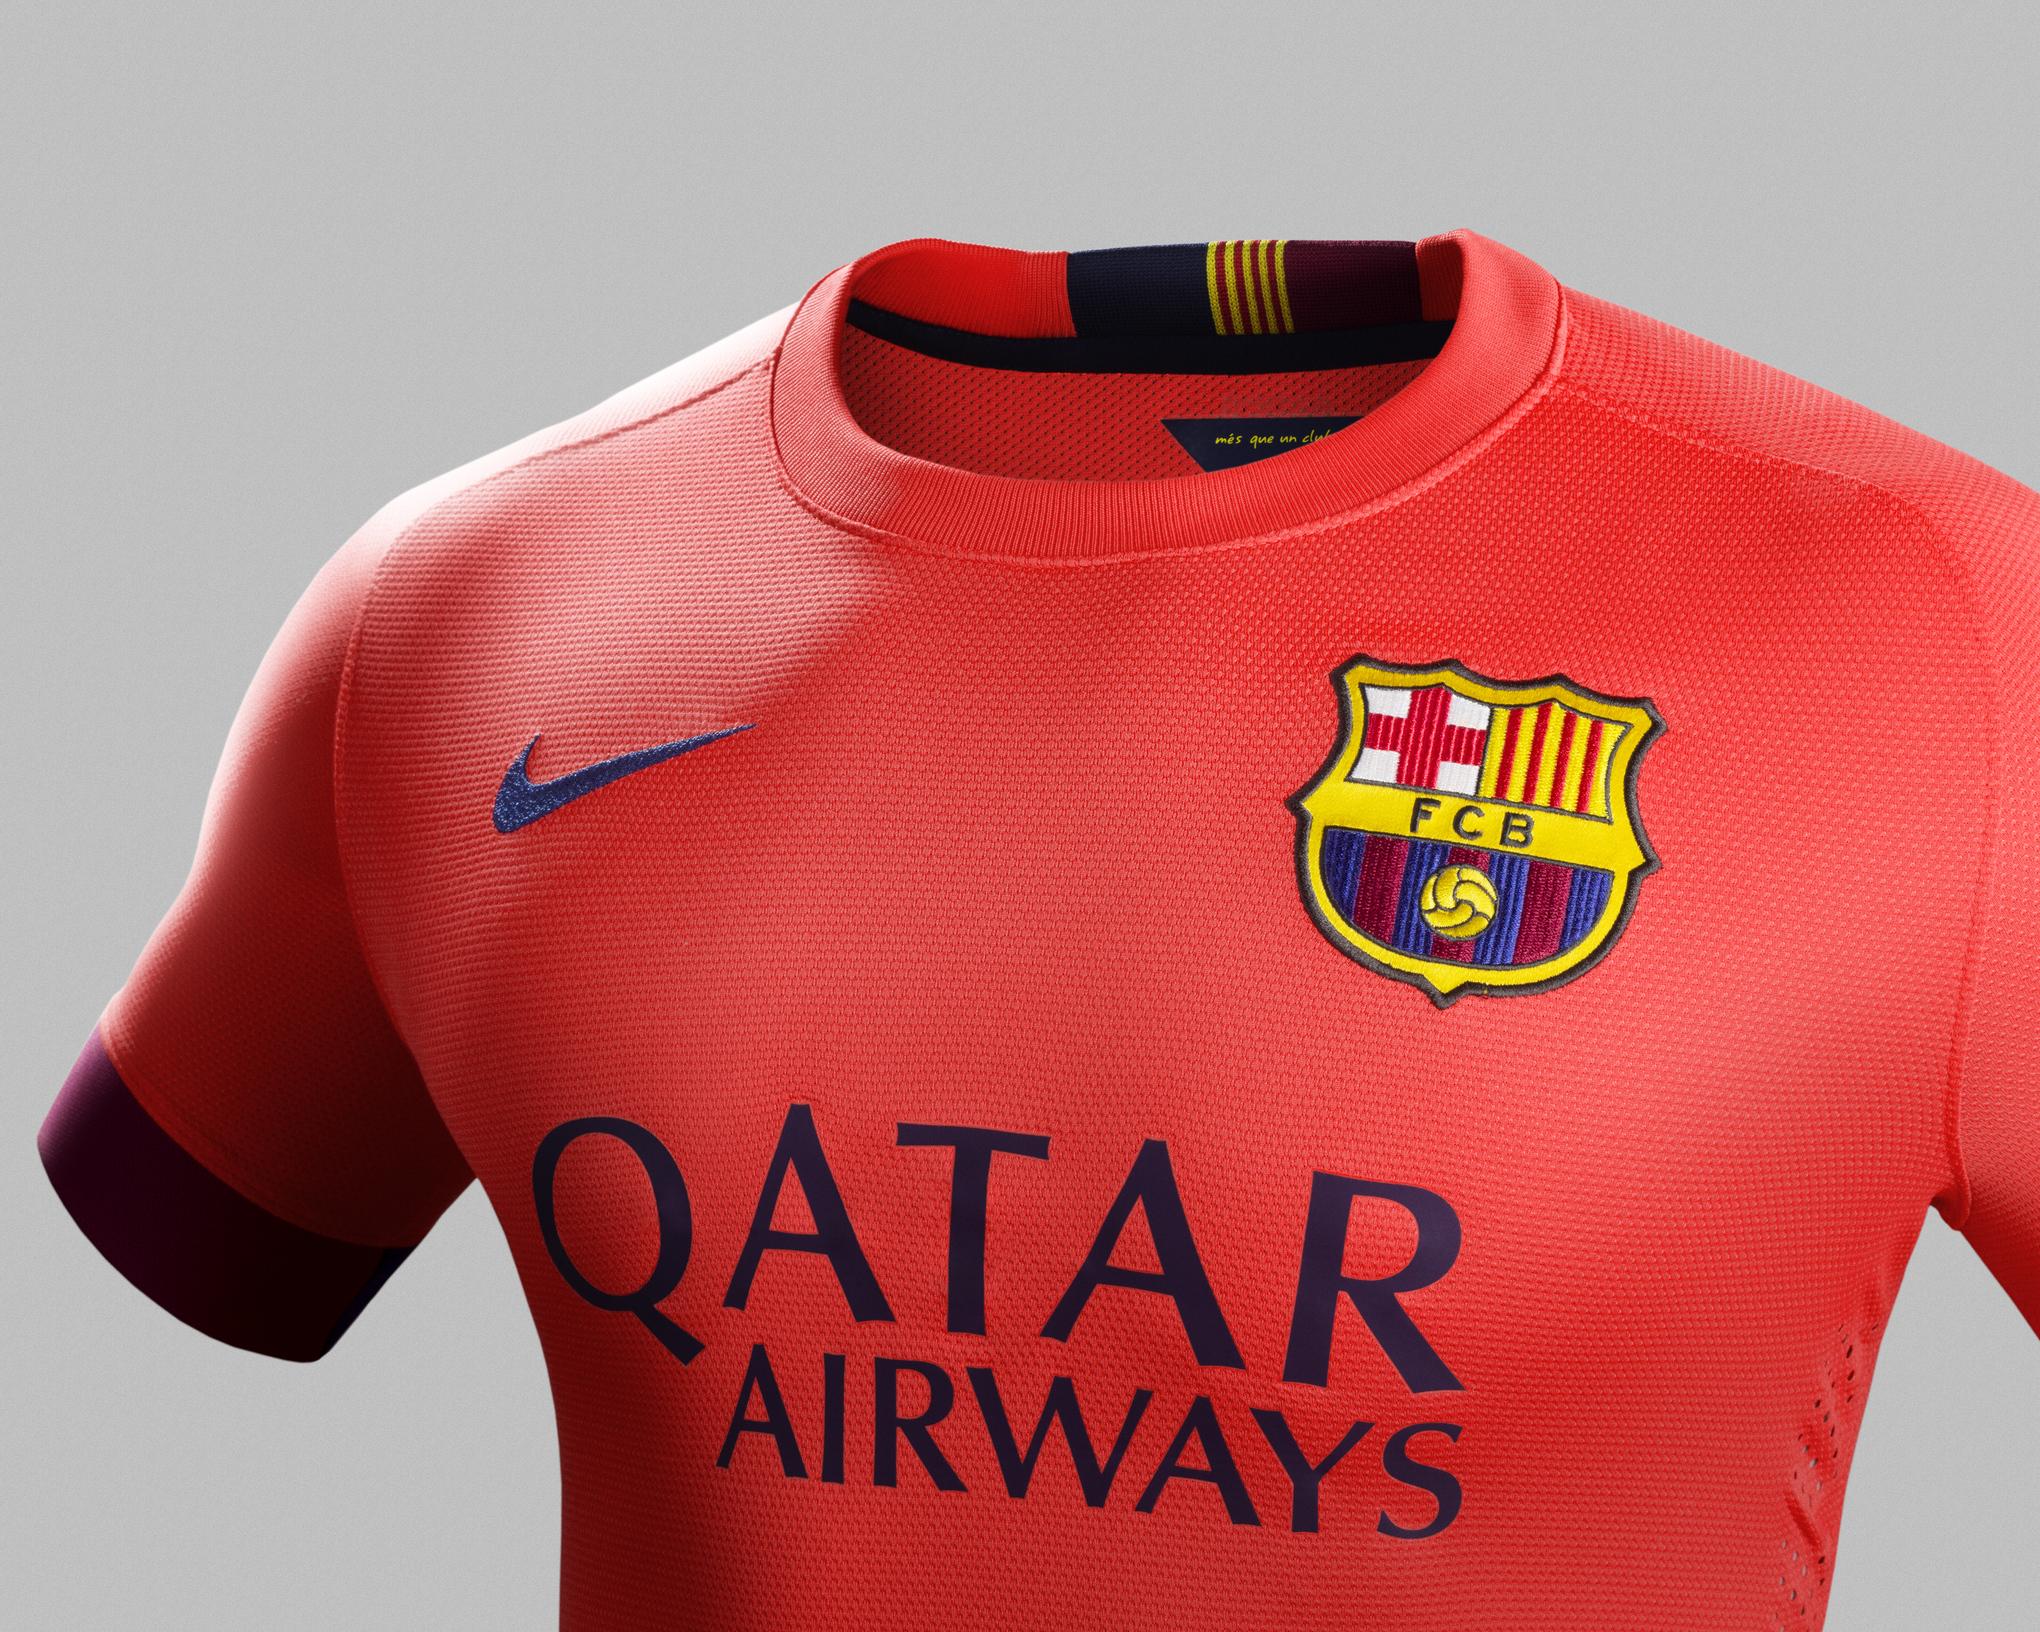 wholesale dealer 8d0d3 339ee FC Barcelona return to salmon away kit for 2014/15 ...